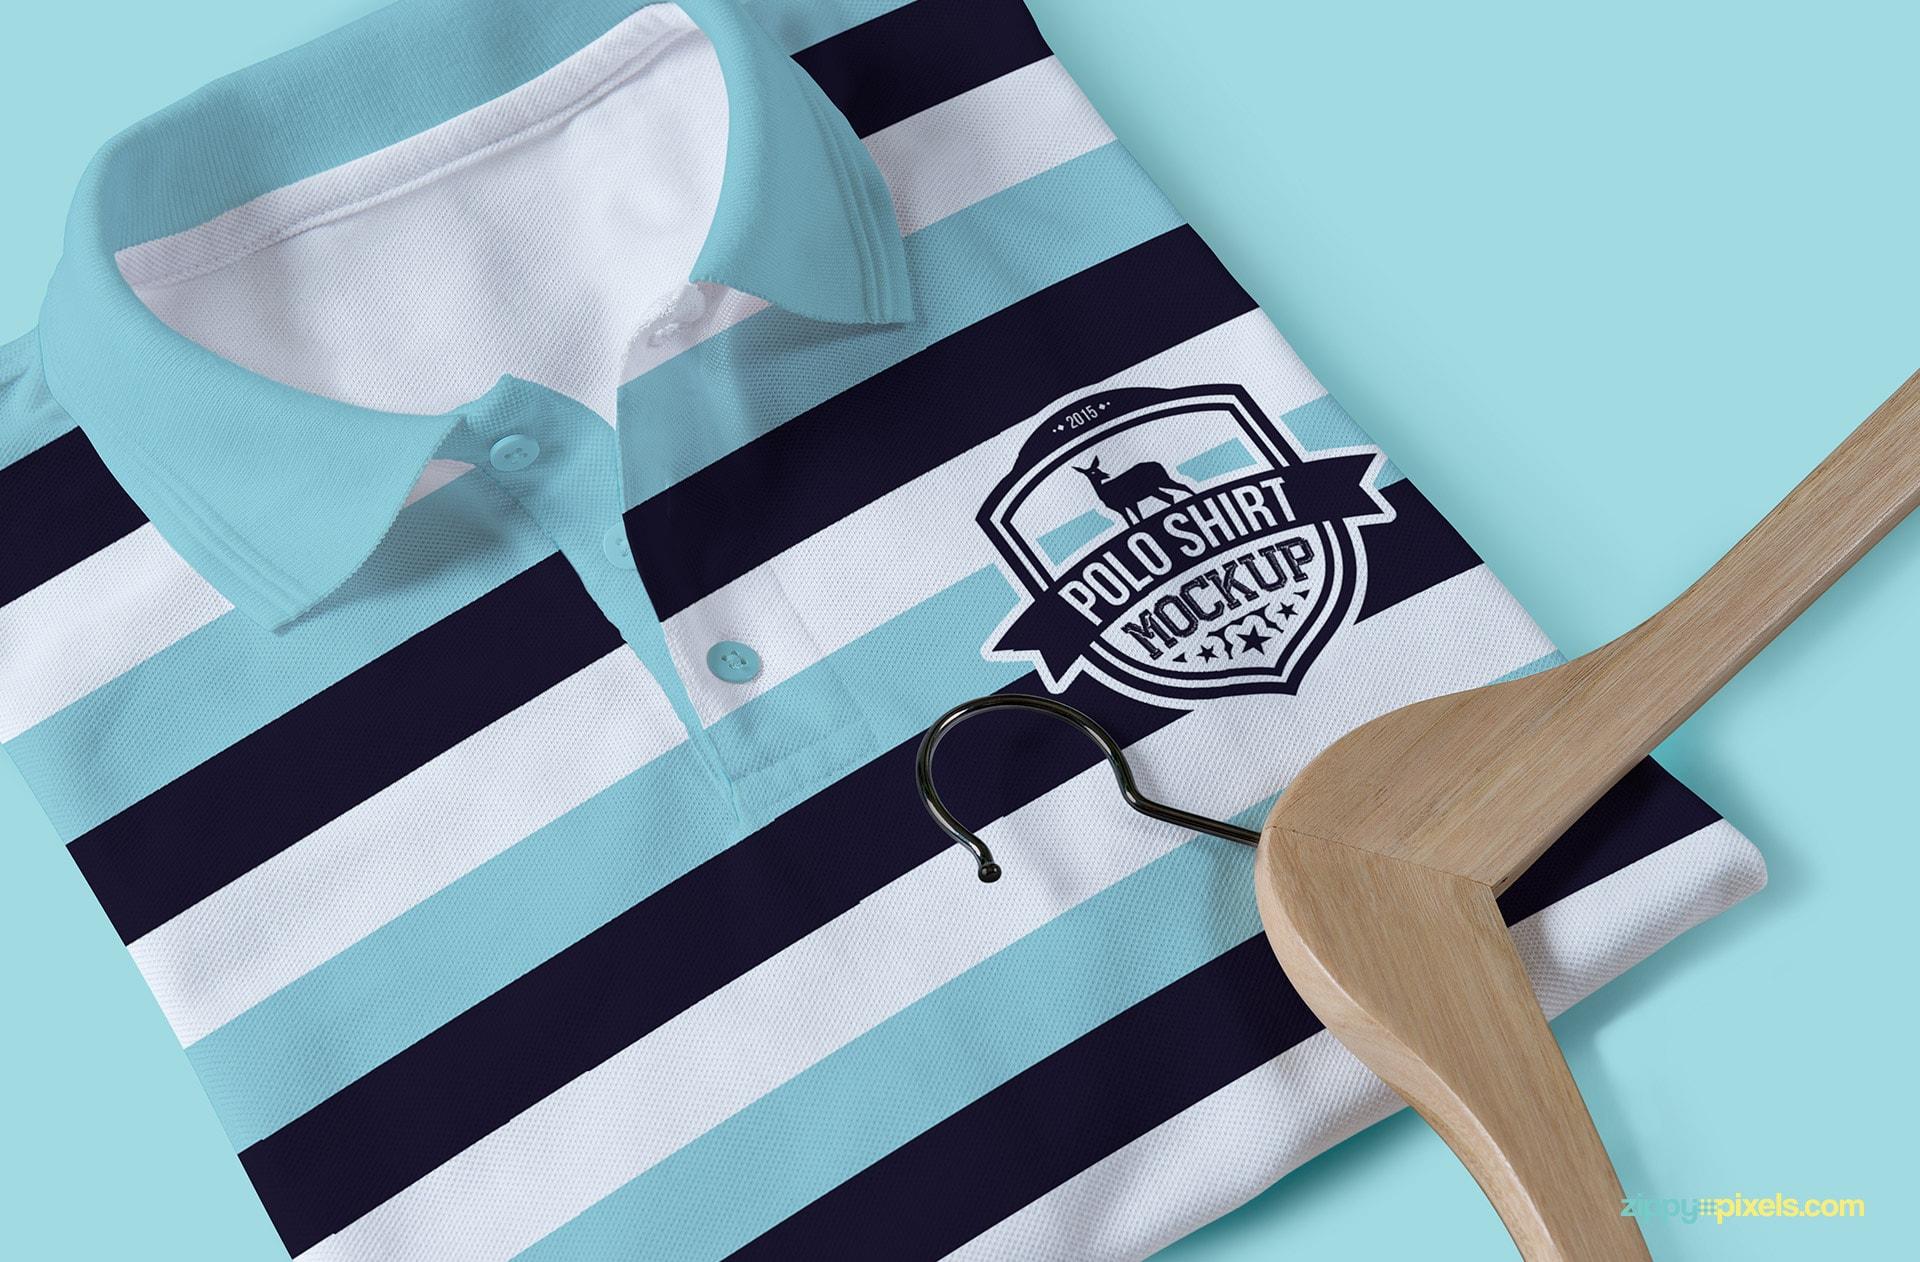 One of the 13 polo shirt mockups